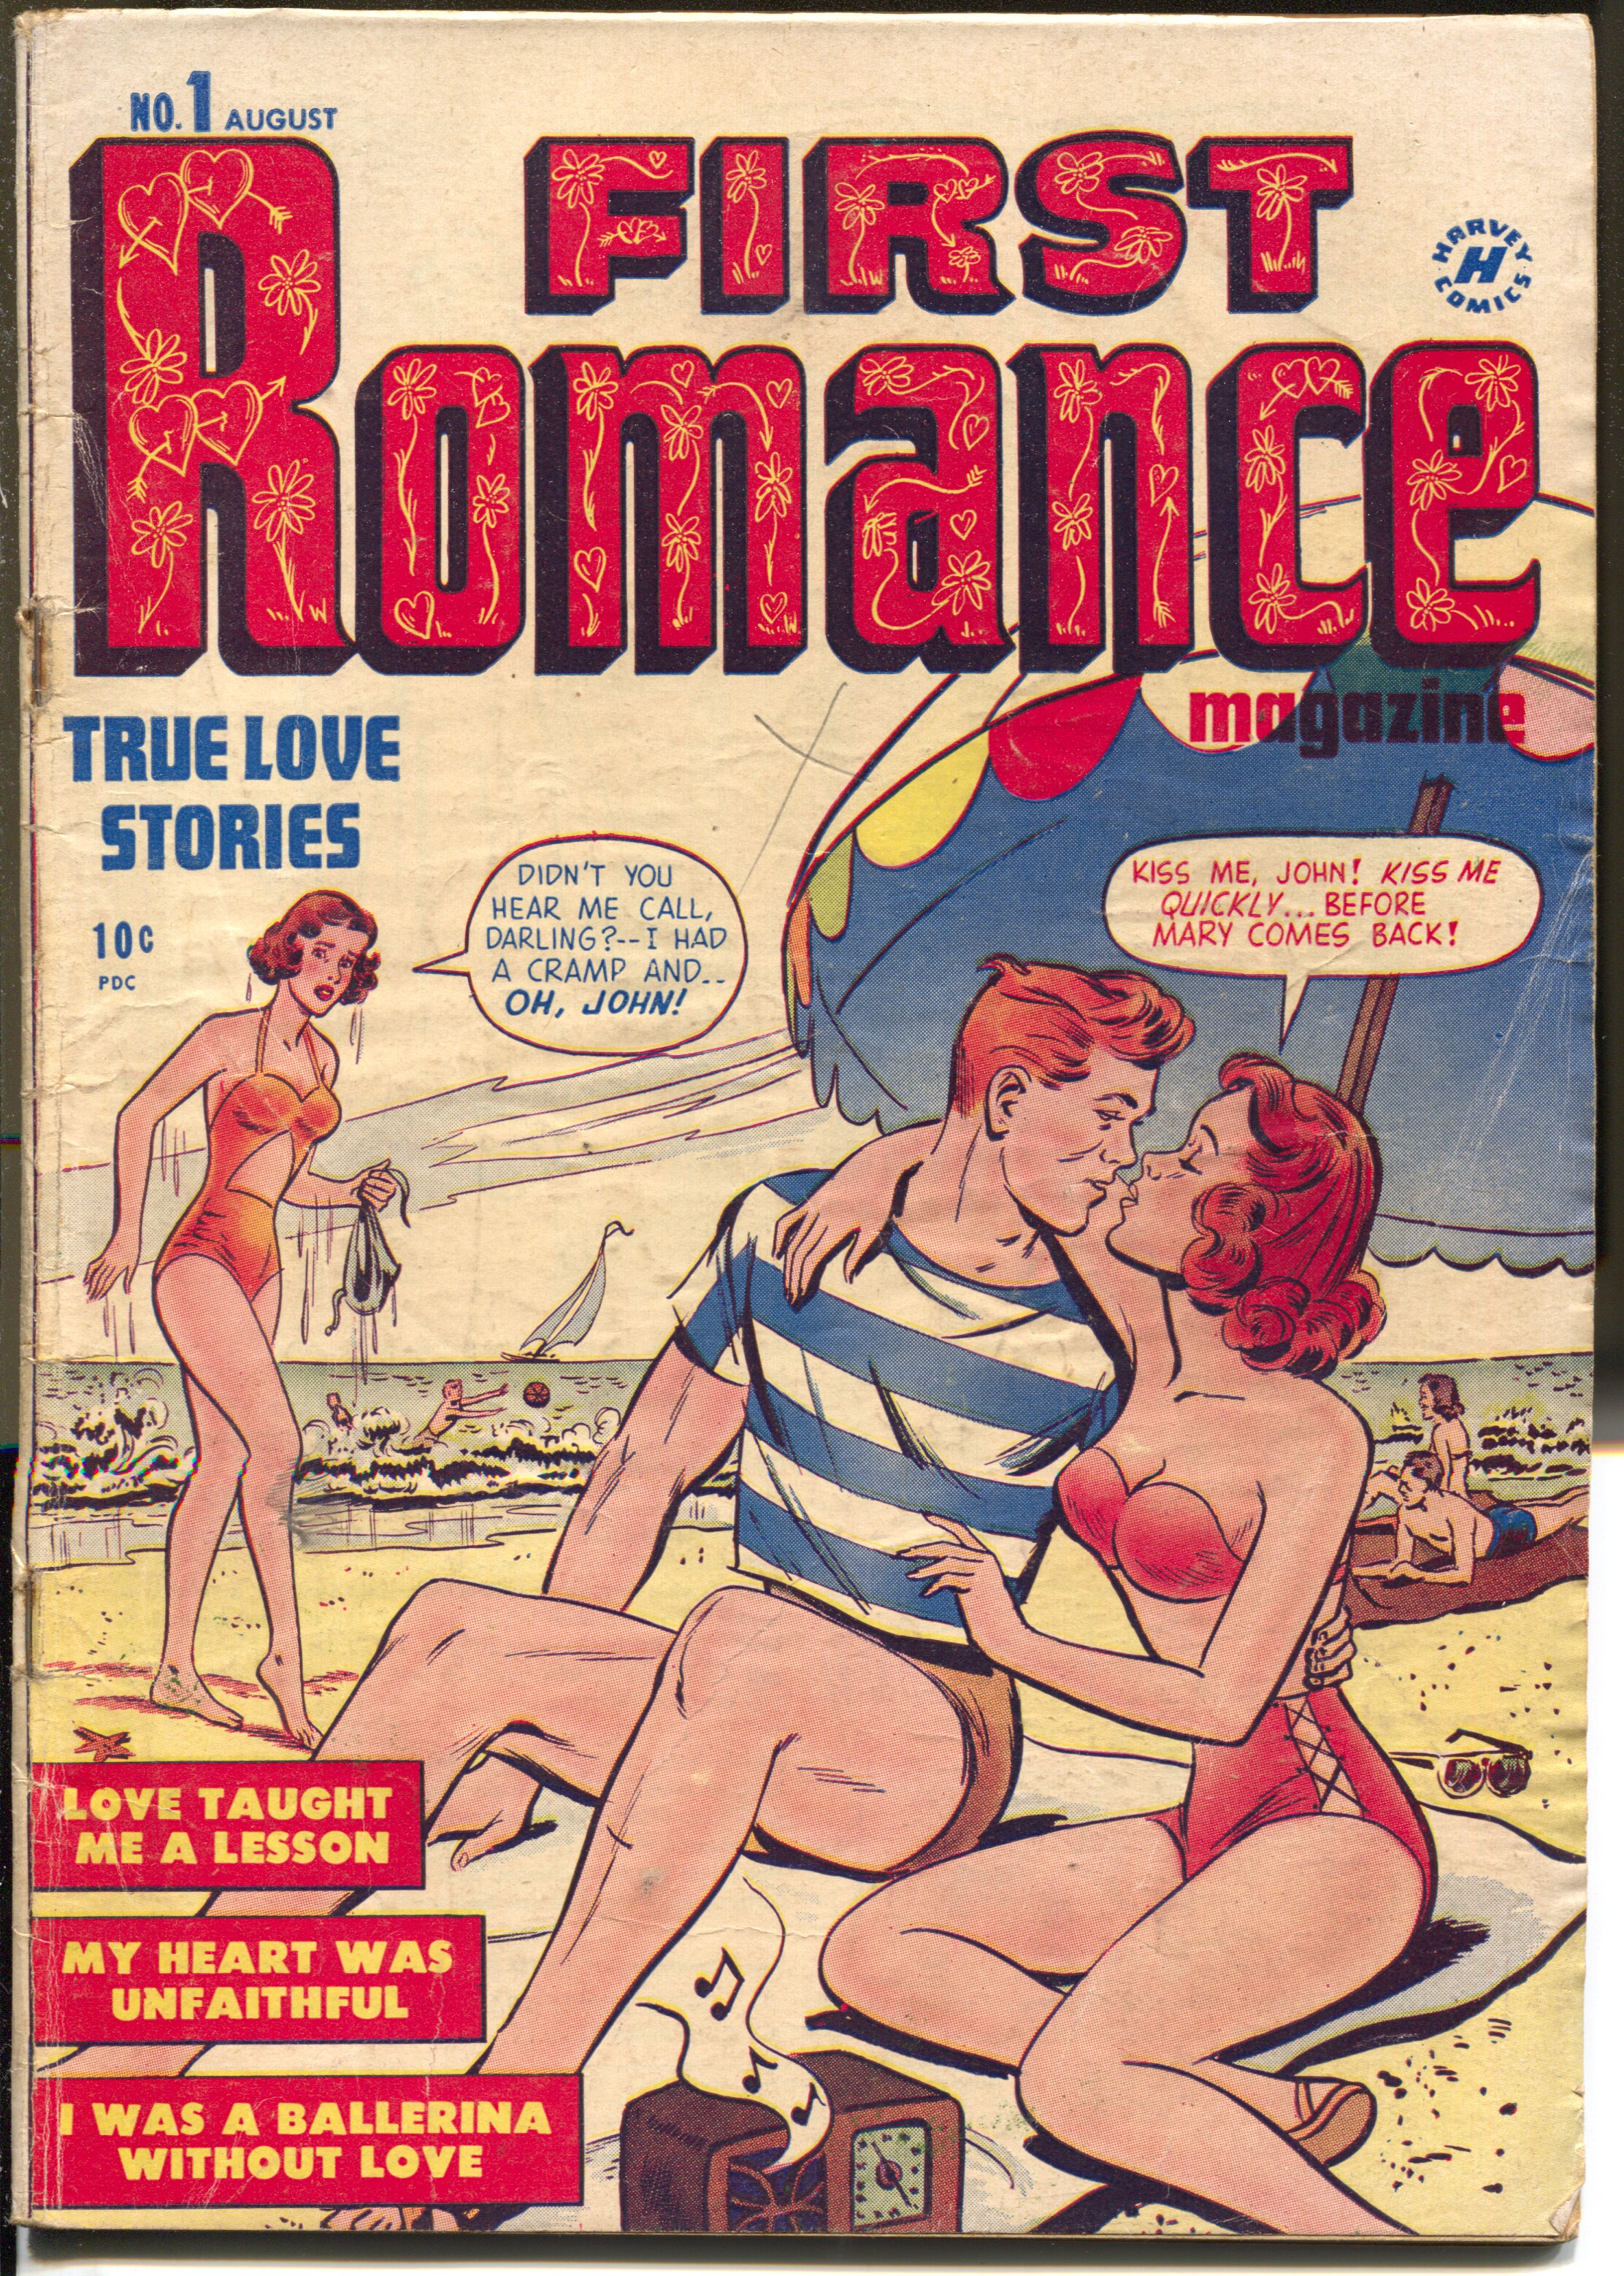 First_Romance_#1_1949-Harvey-1st_issue-Bob_Powell_art-swim_suit_-VG____[Very_Good]